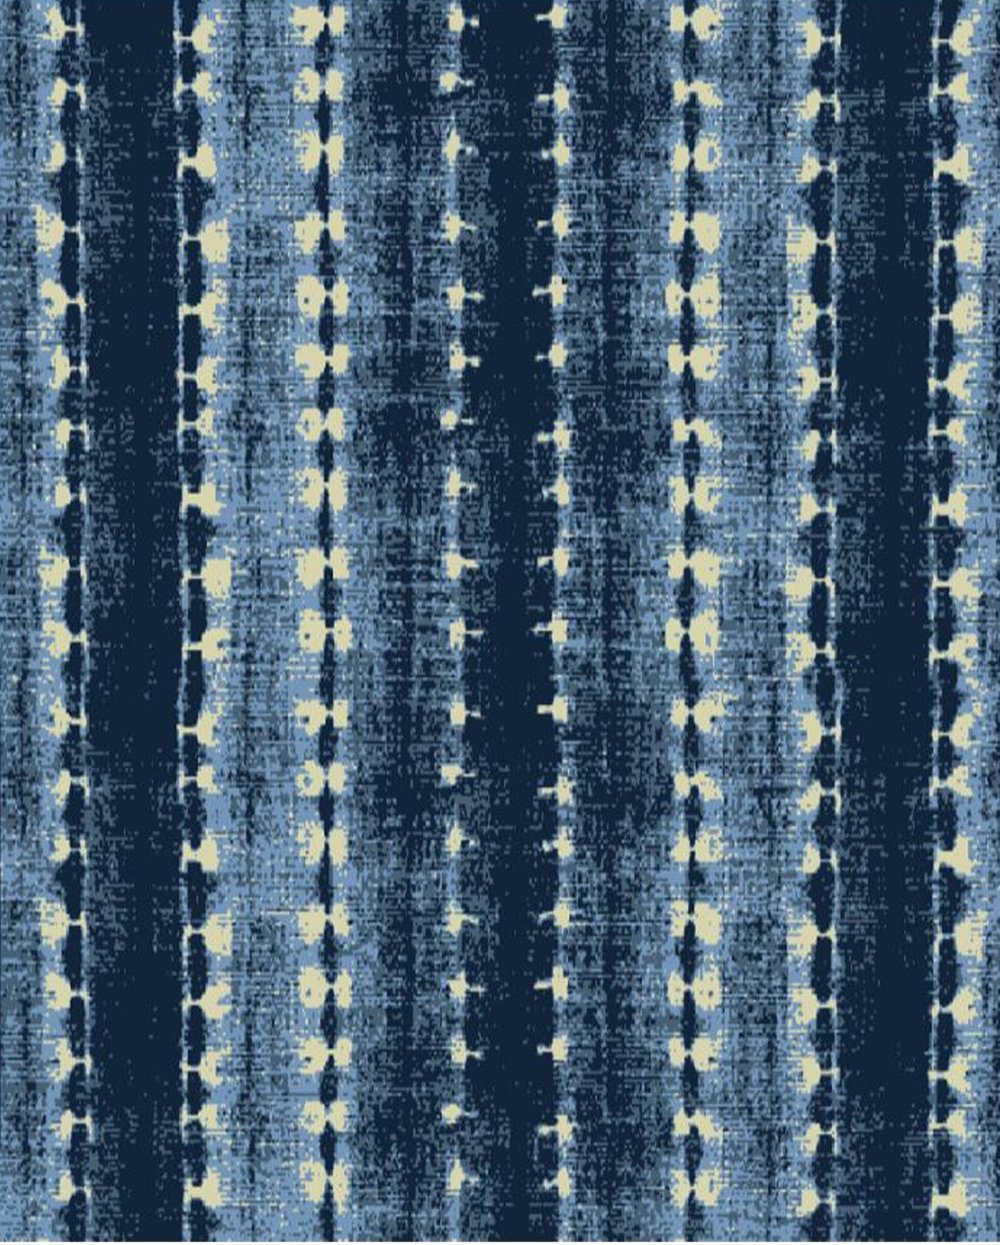 EF 6-17-18 RUG 2 , 8X10 , 40 Knots (Design Plate) (2).jpg